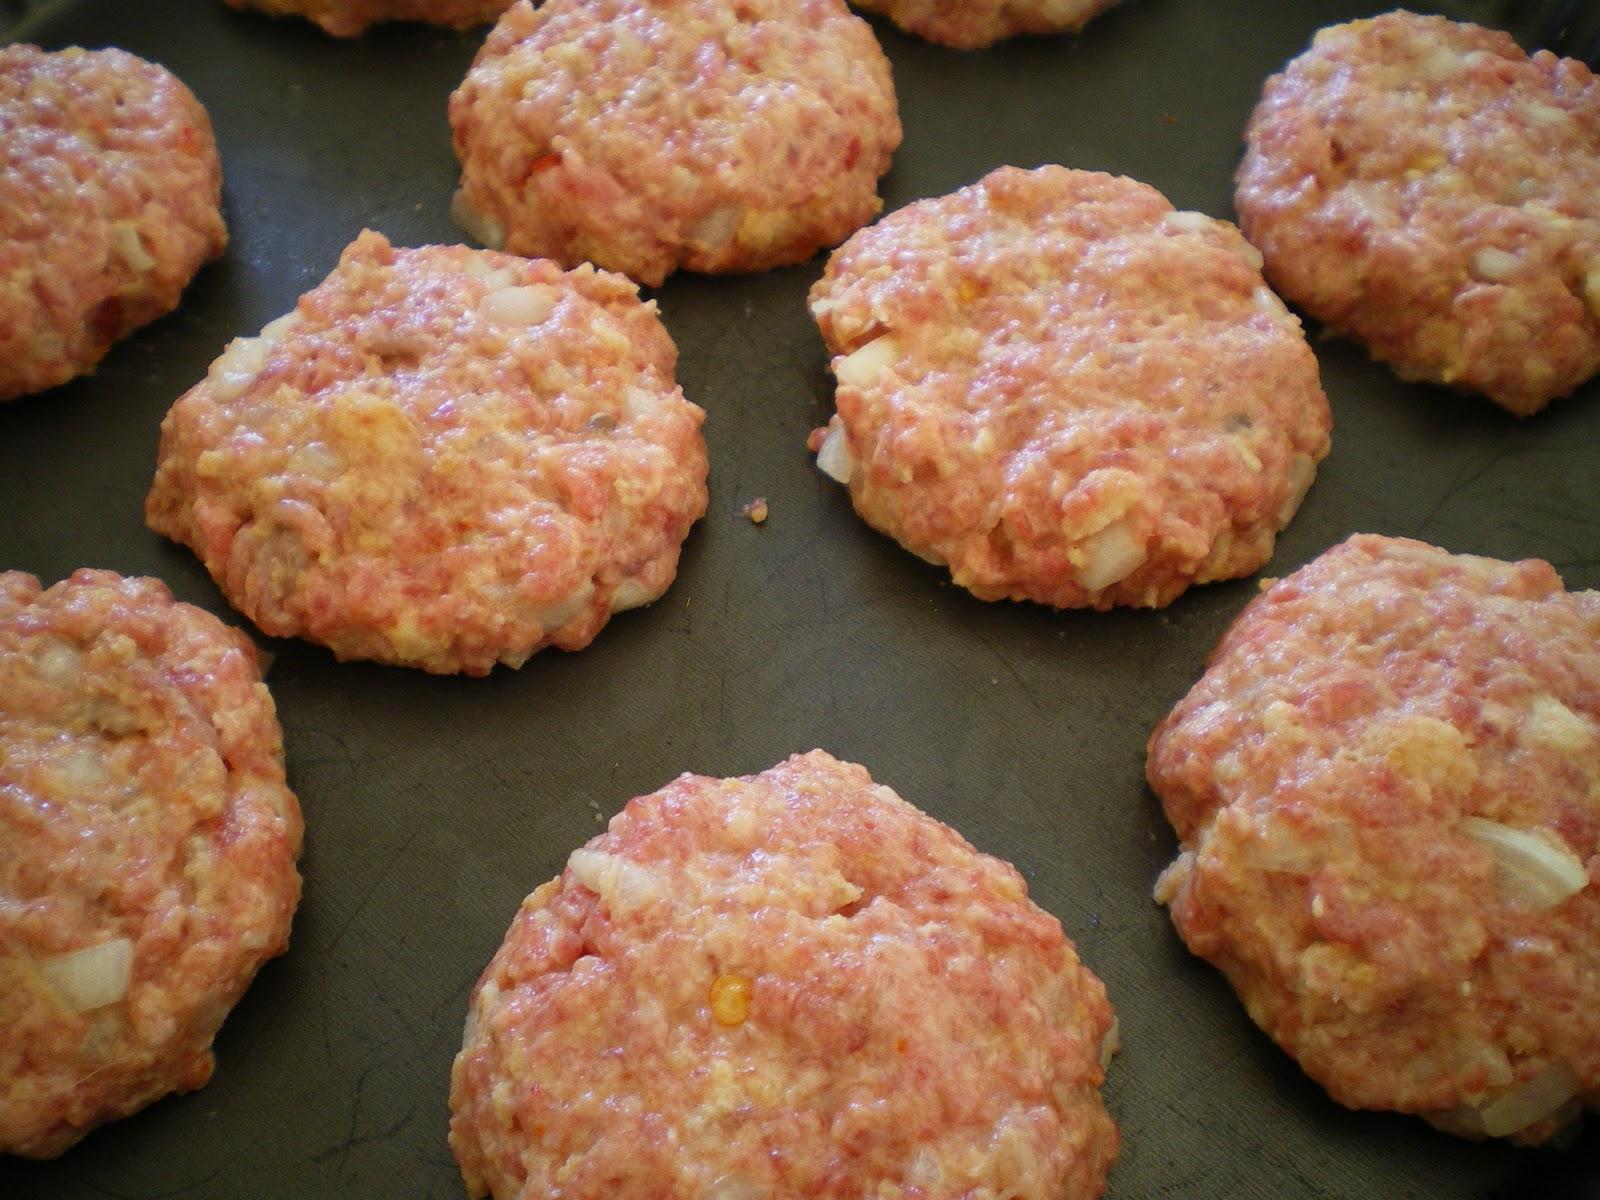 Shelly's Kitchen: Oven Baked Mini-Hamburgers